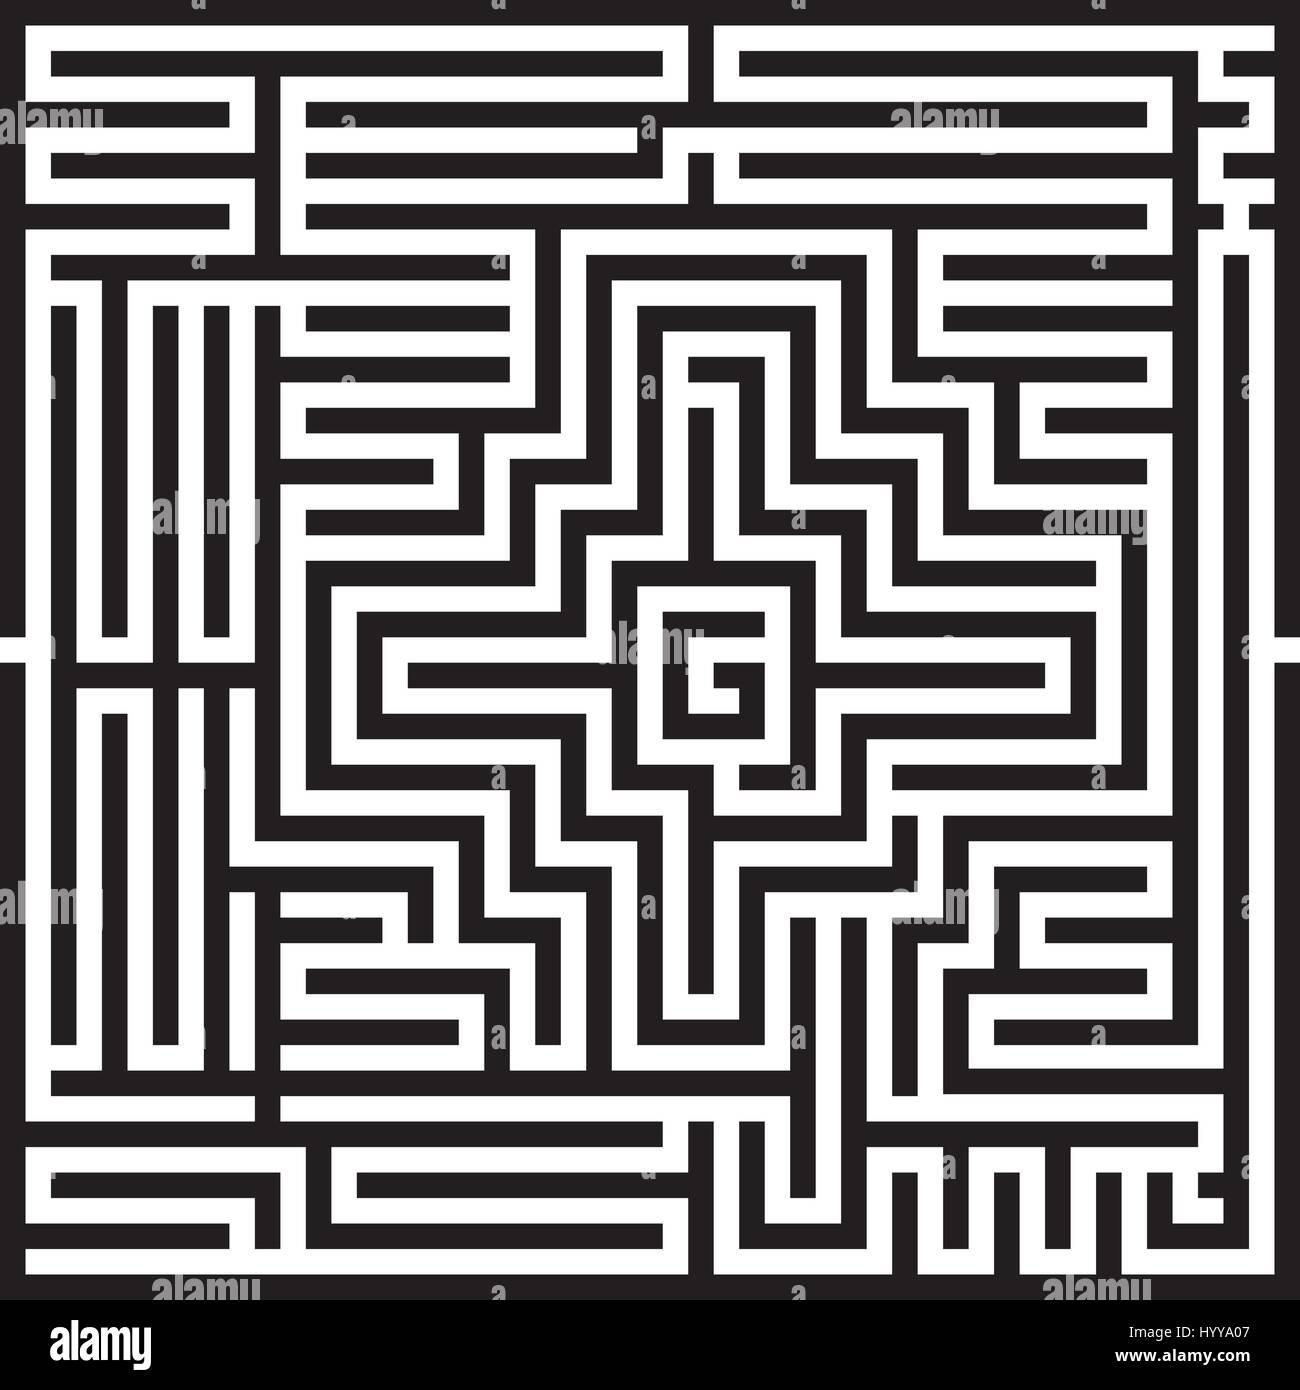 Labyrinth - Stock Image